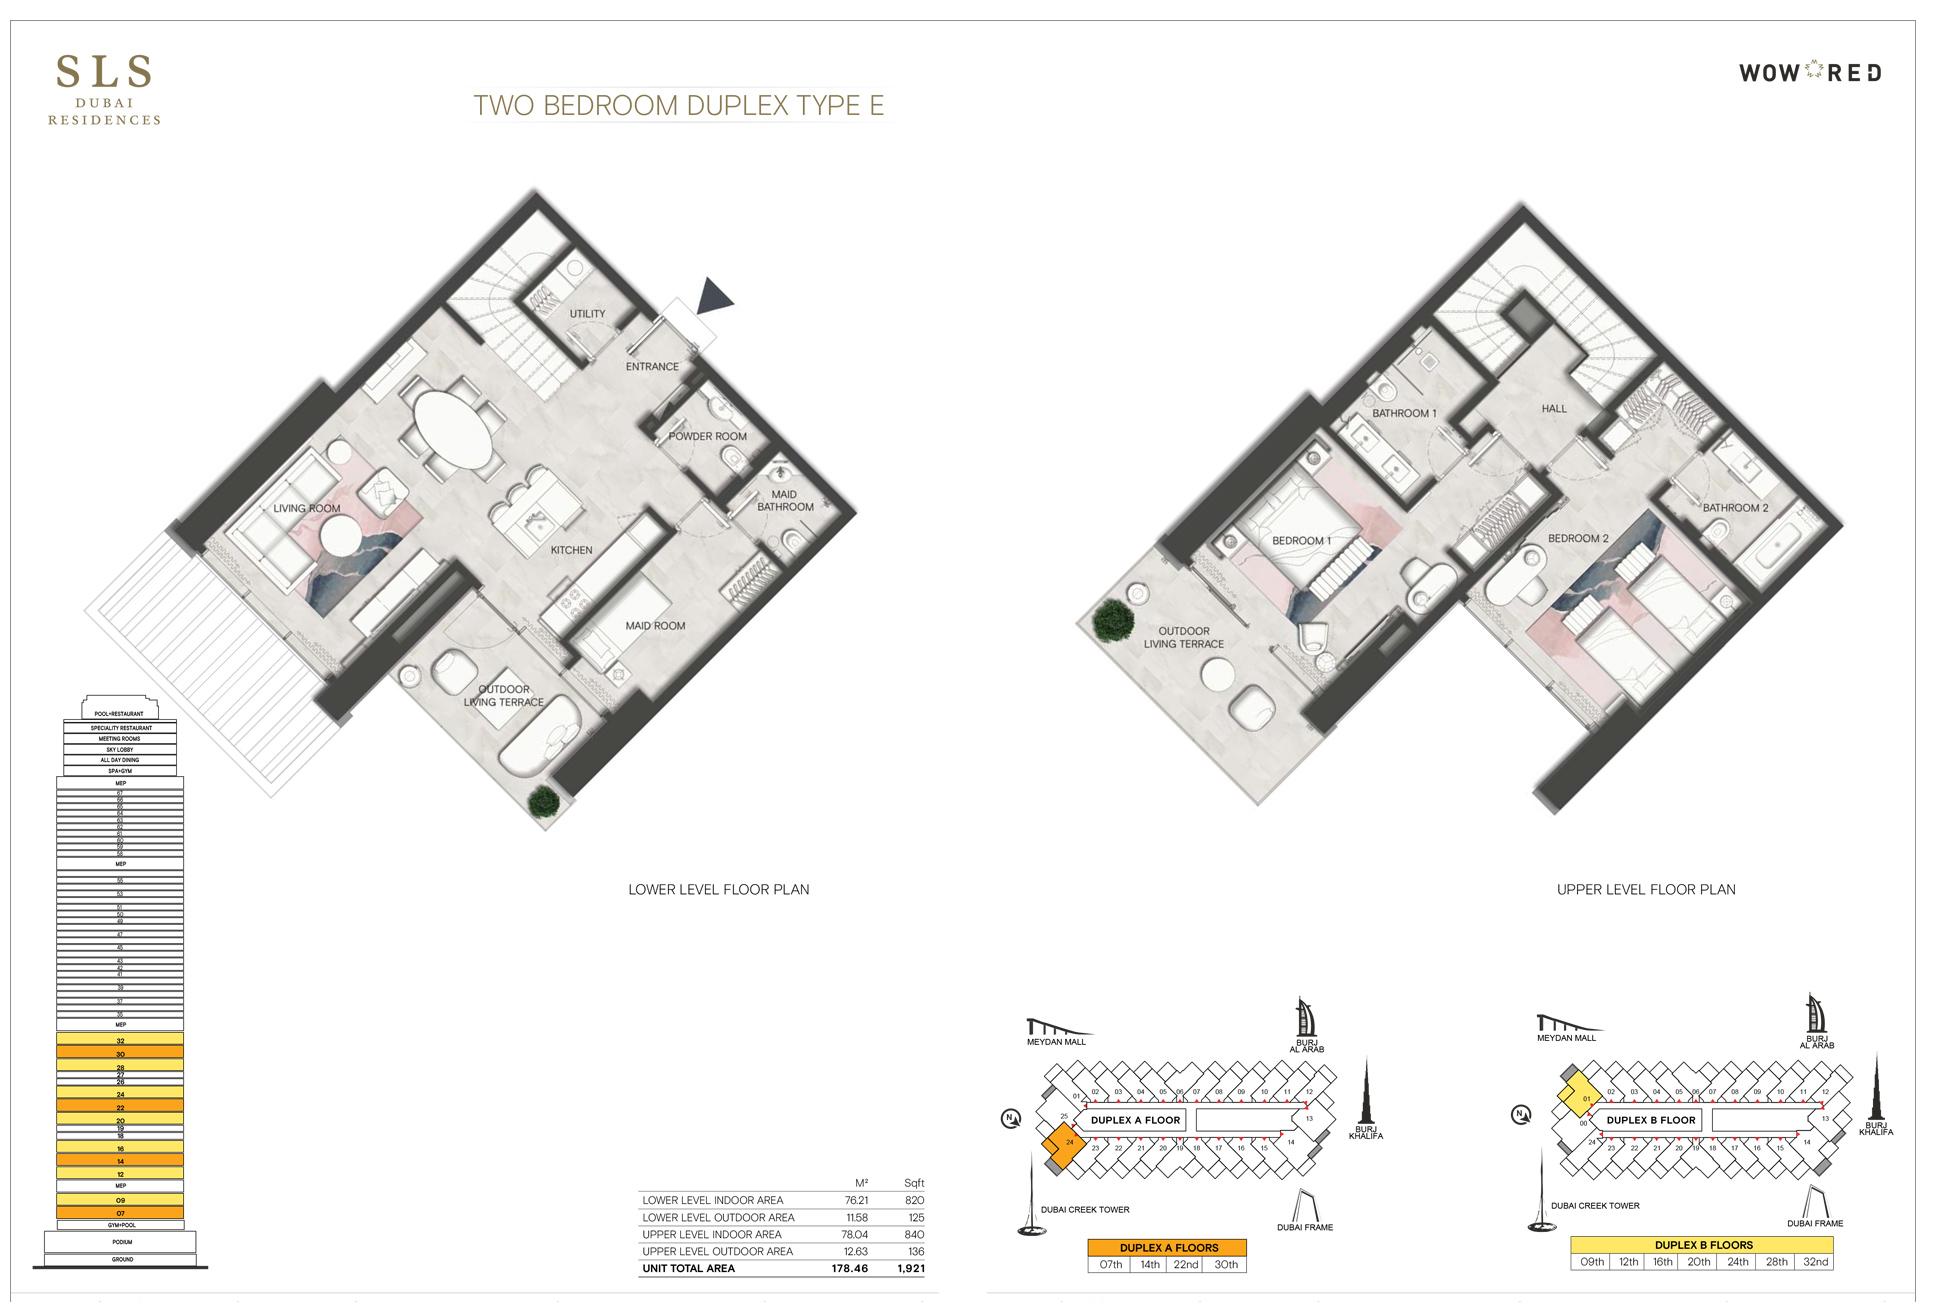 2 Bedroom Duplex Type E Size 1921 sq.ft